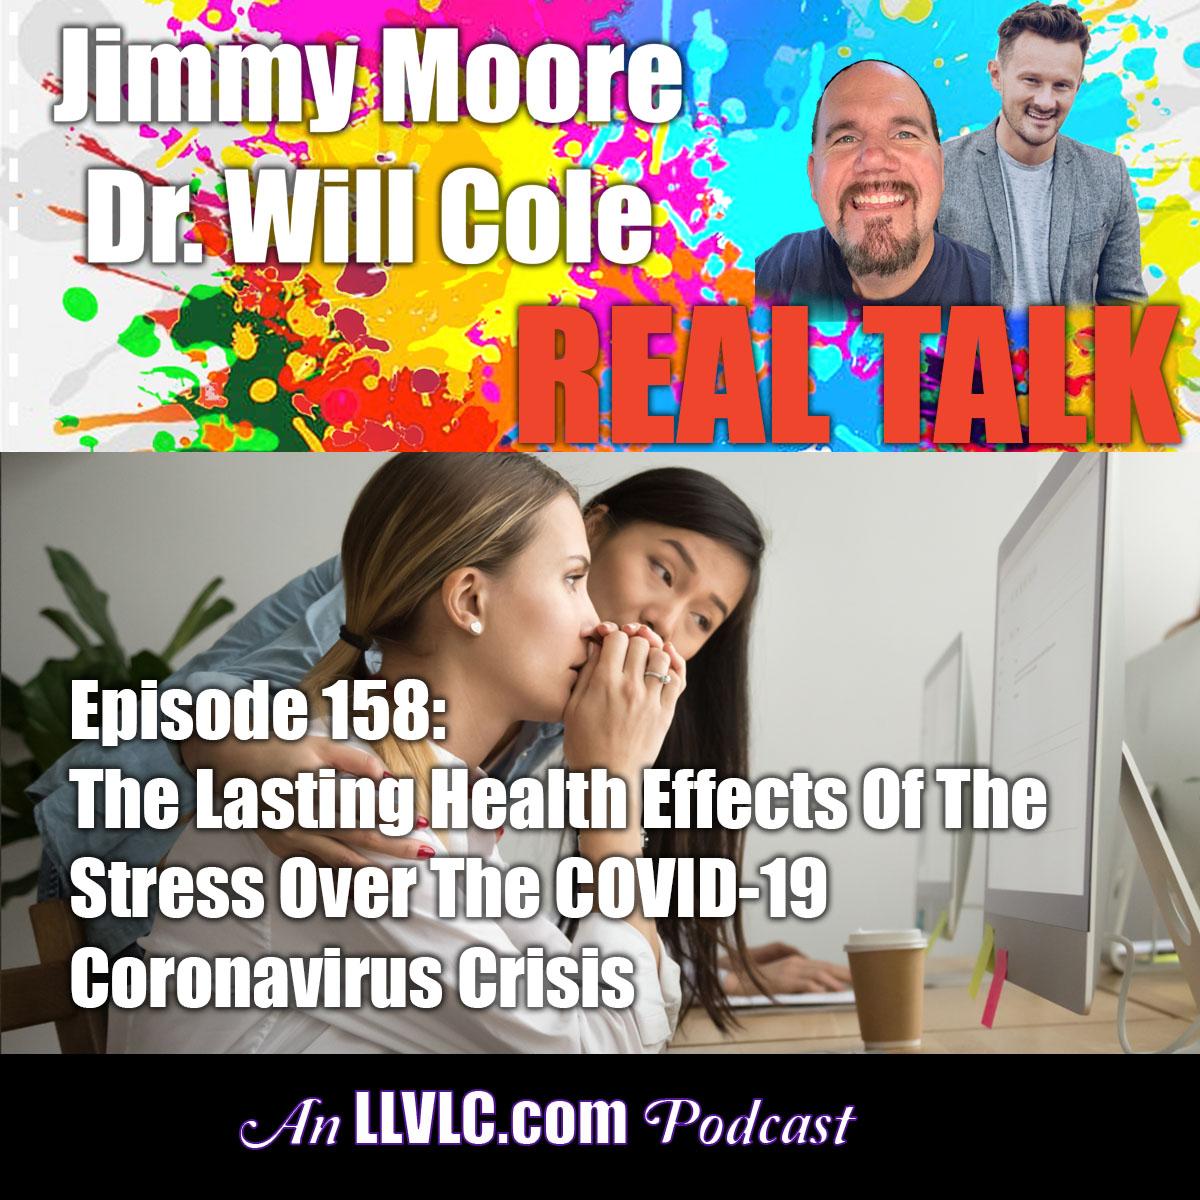 Real Talk Episode 158